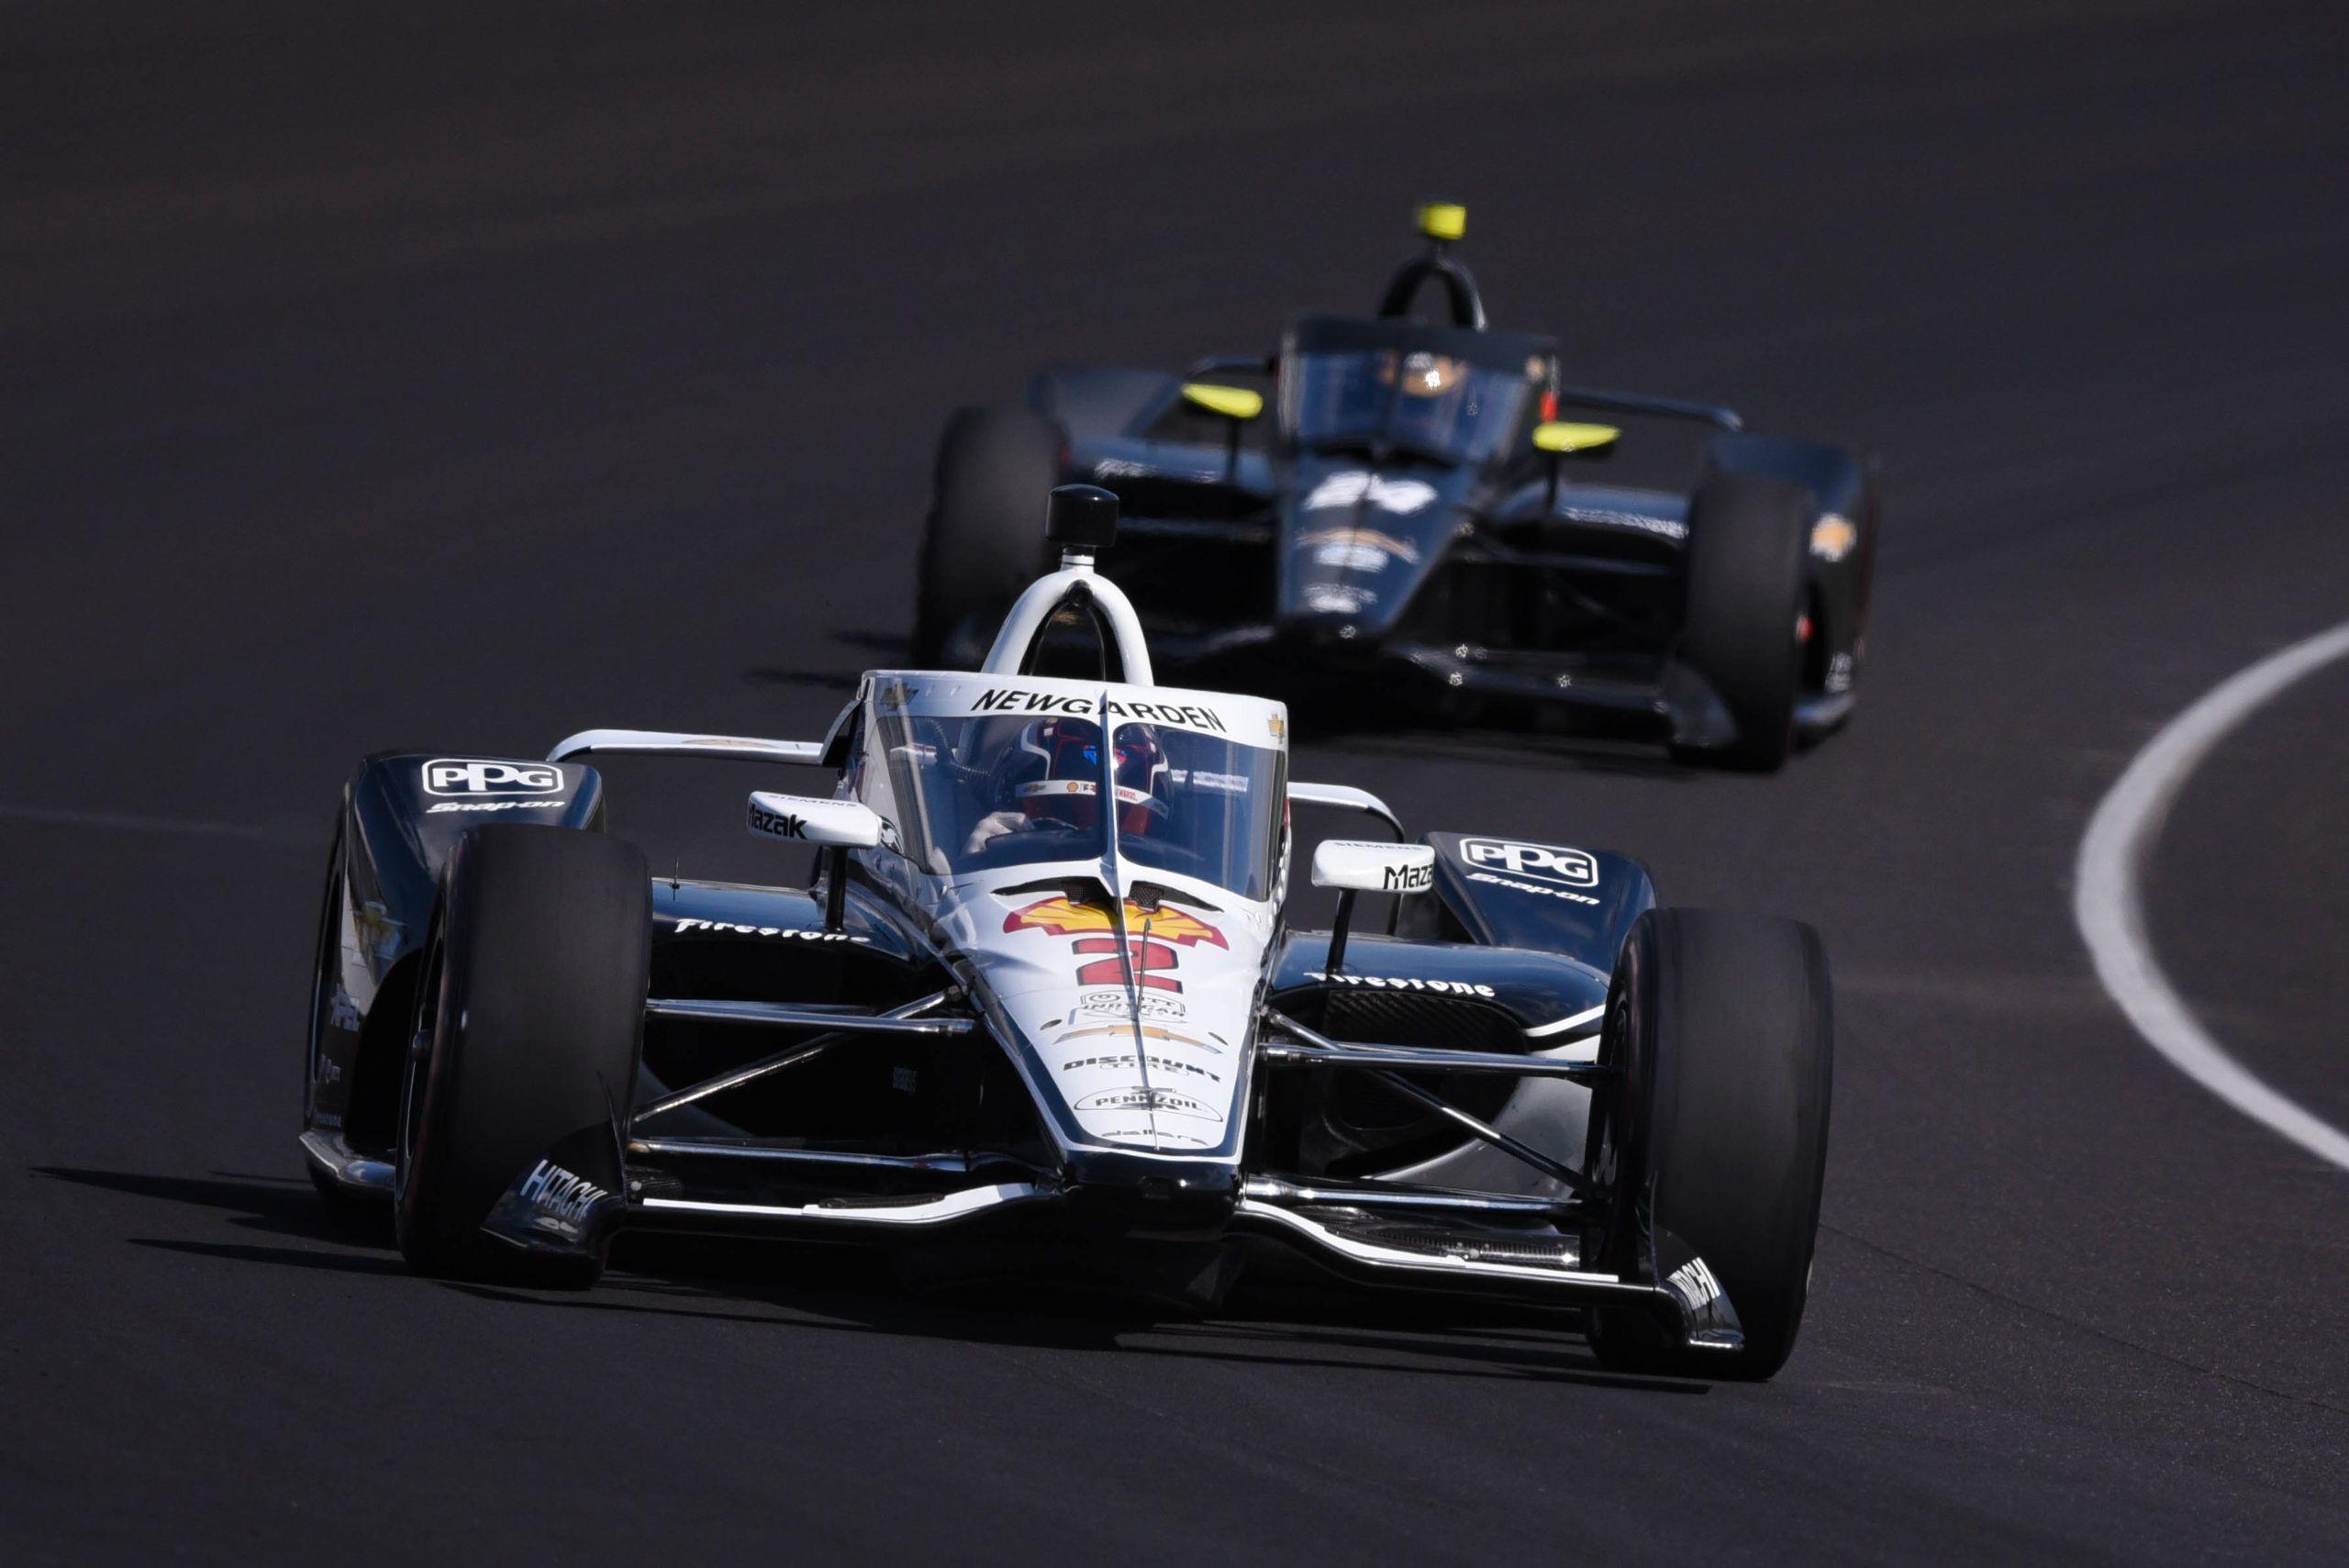 Josef Newgarden, Team Penske, Indy500, IndyCar, IndyCar 2021